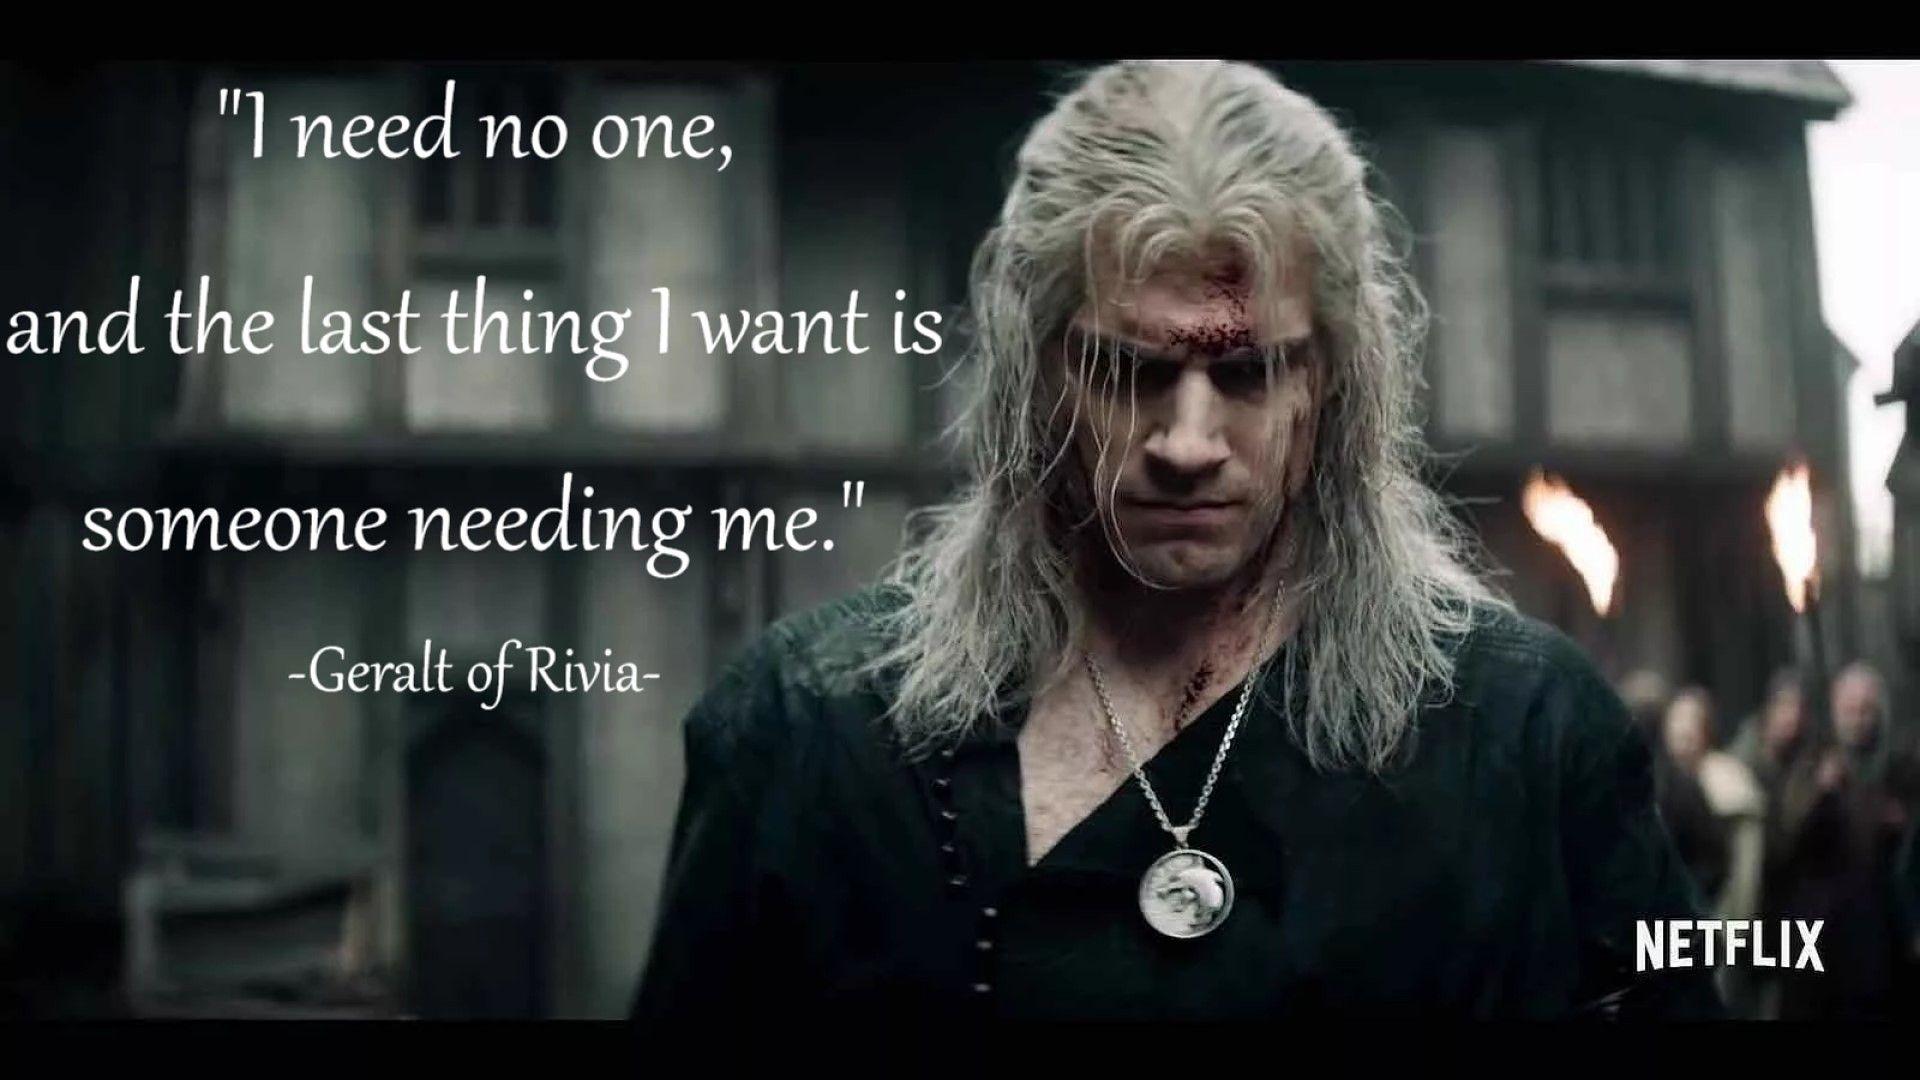 Geralt Of Rivia The Witcher Books Netflix Quotes Geralt Of Rivia